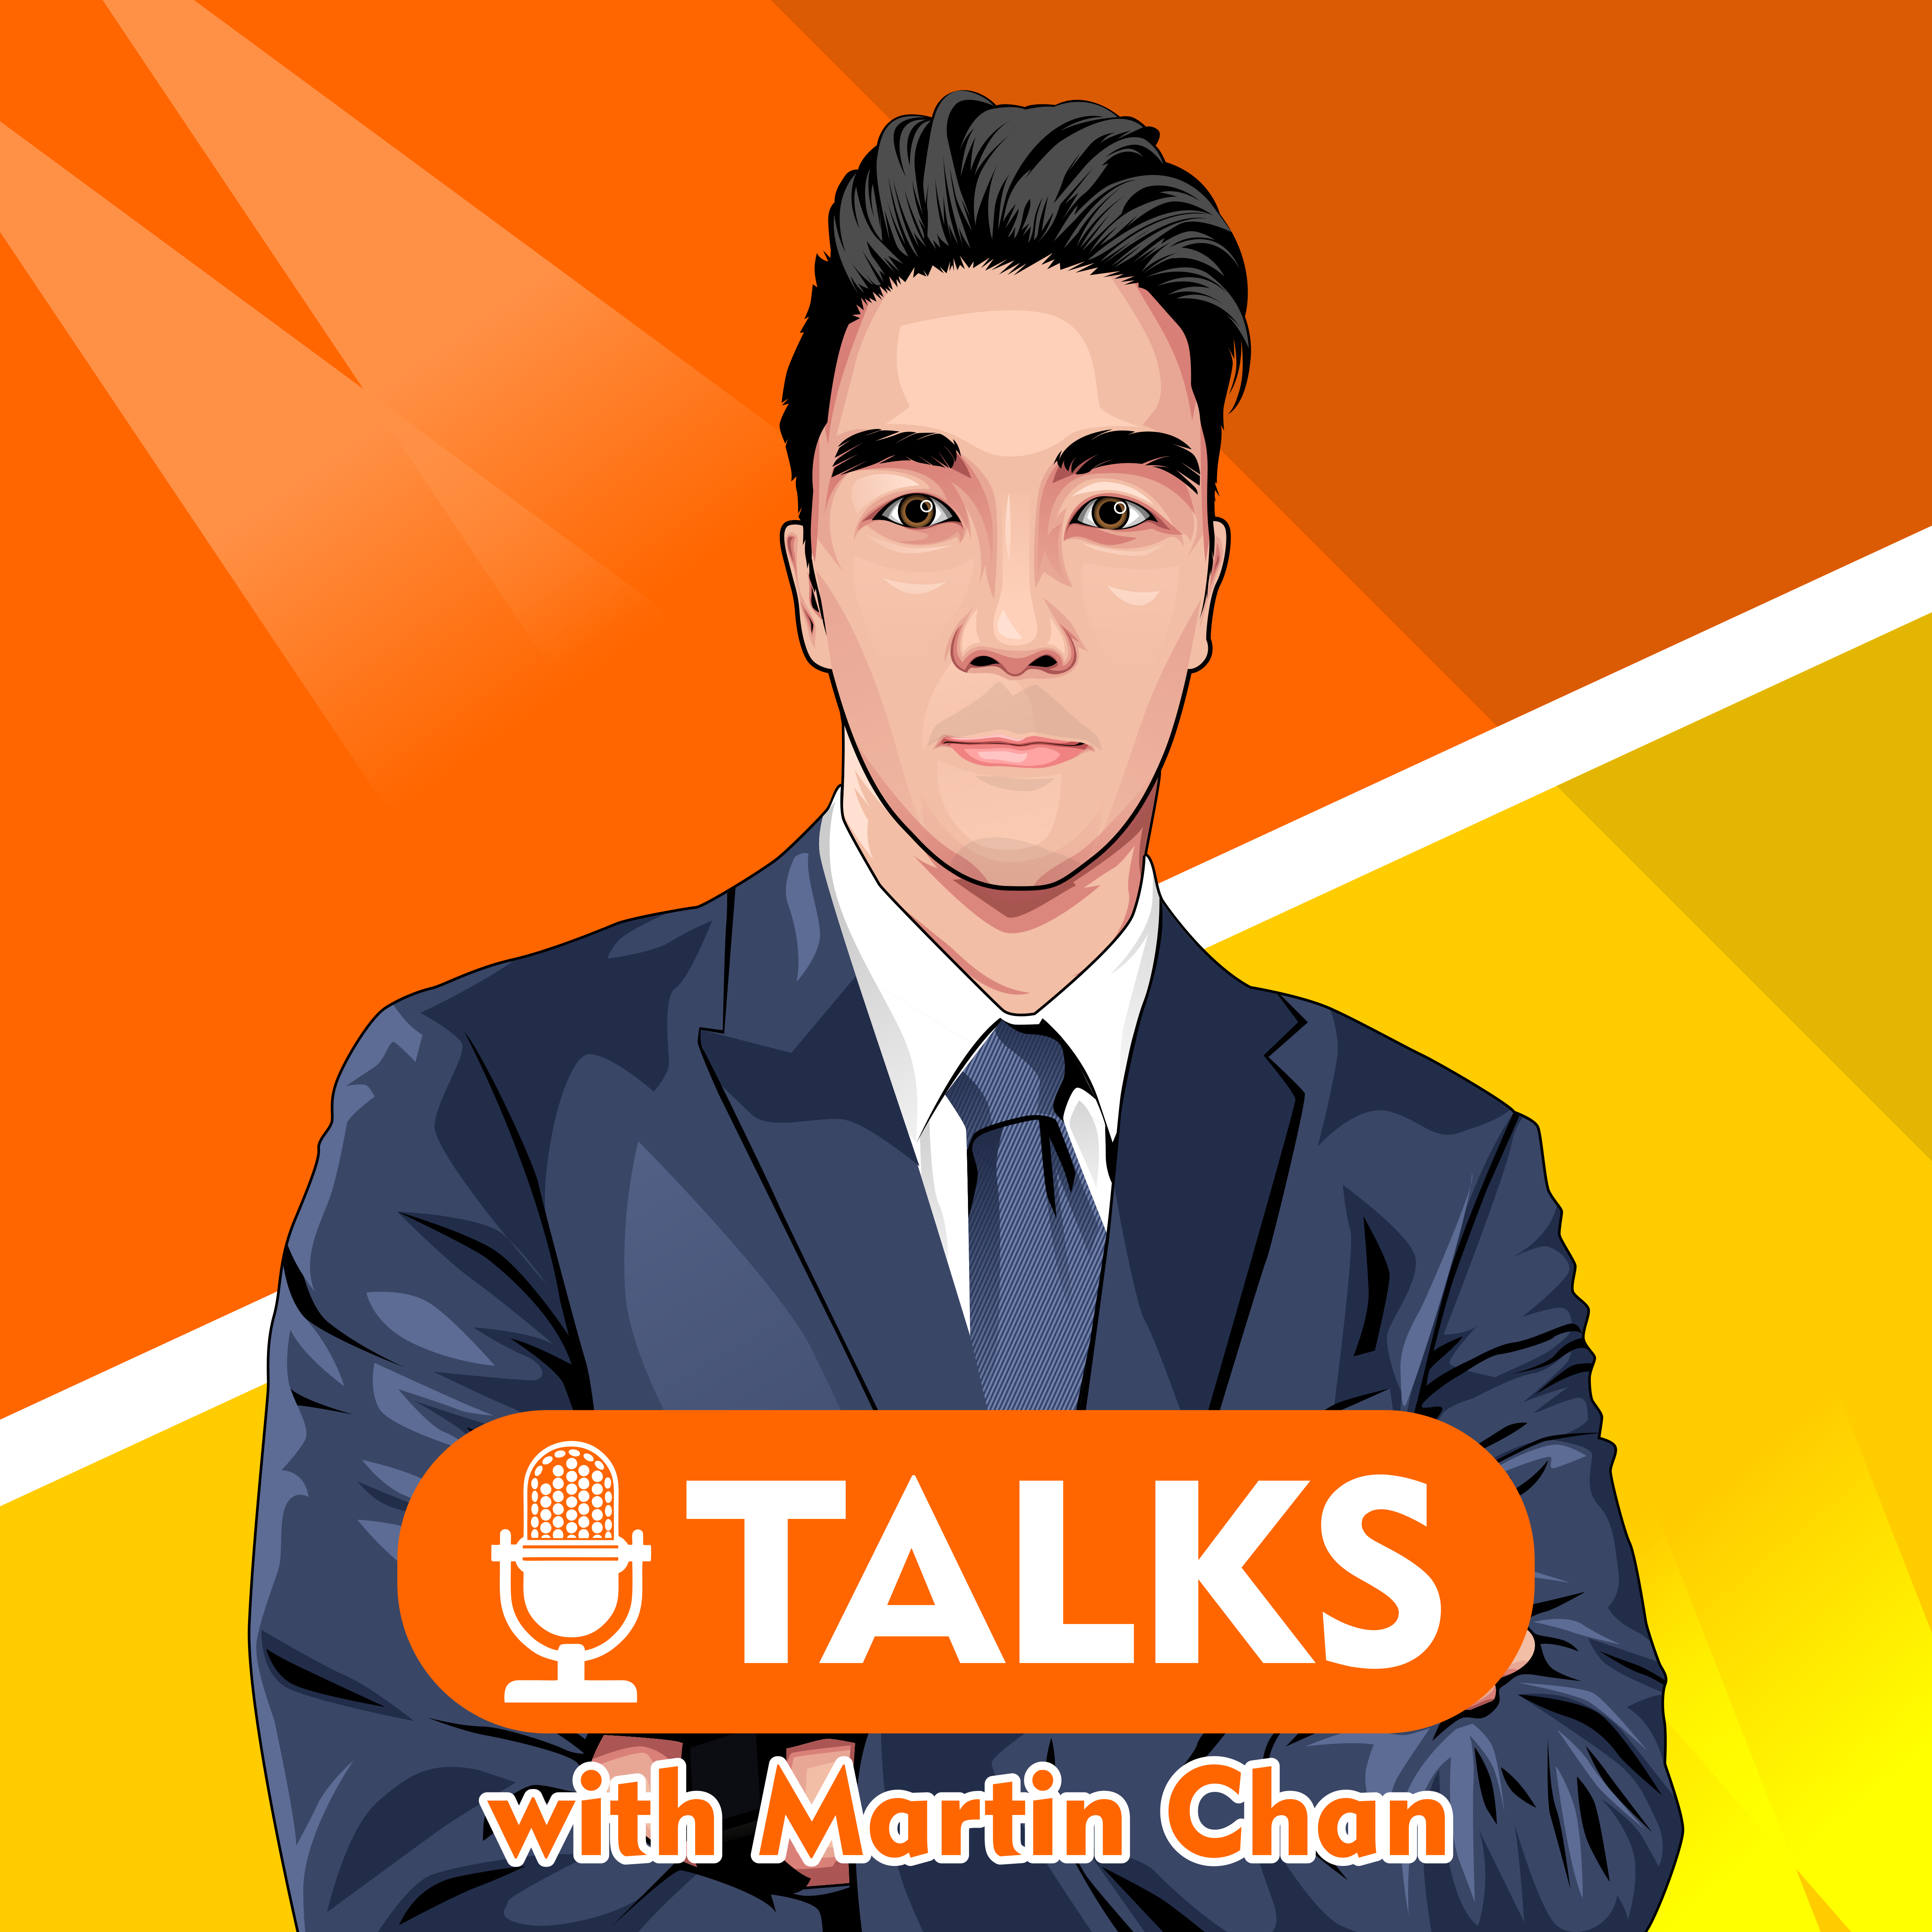 @talkswithmc Profile Image | Linktree